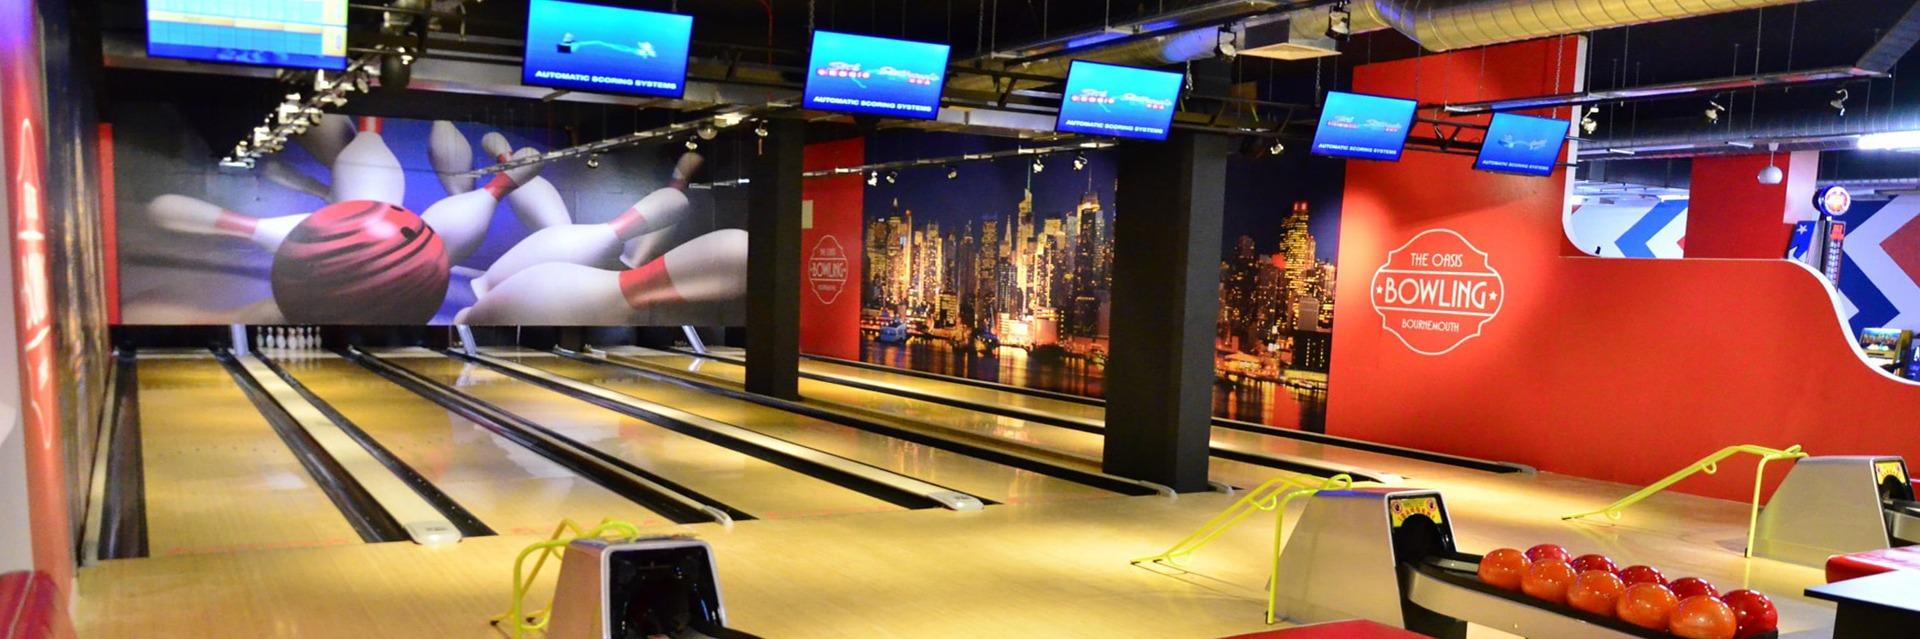 bowling02-min-1